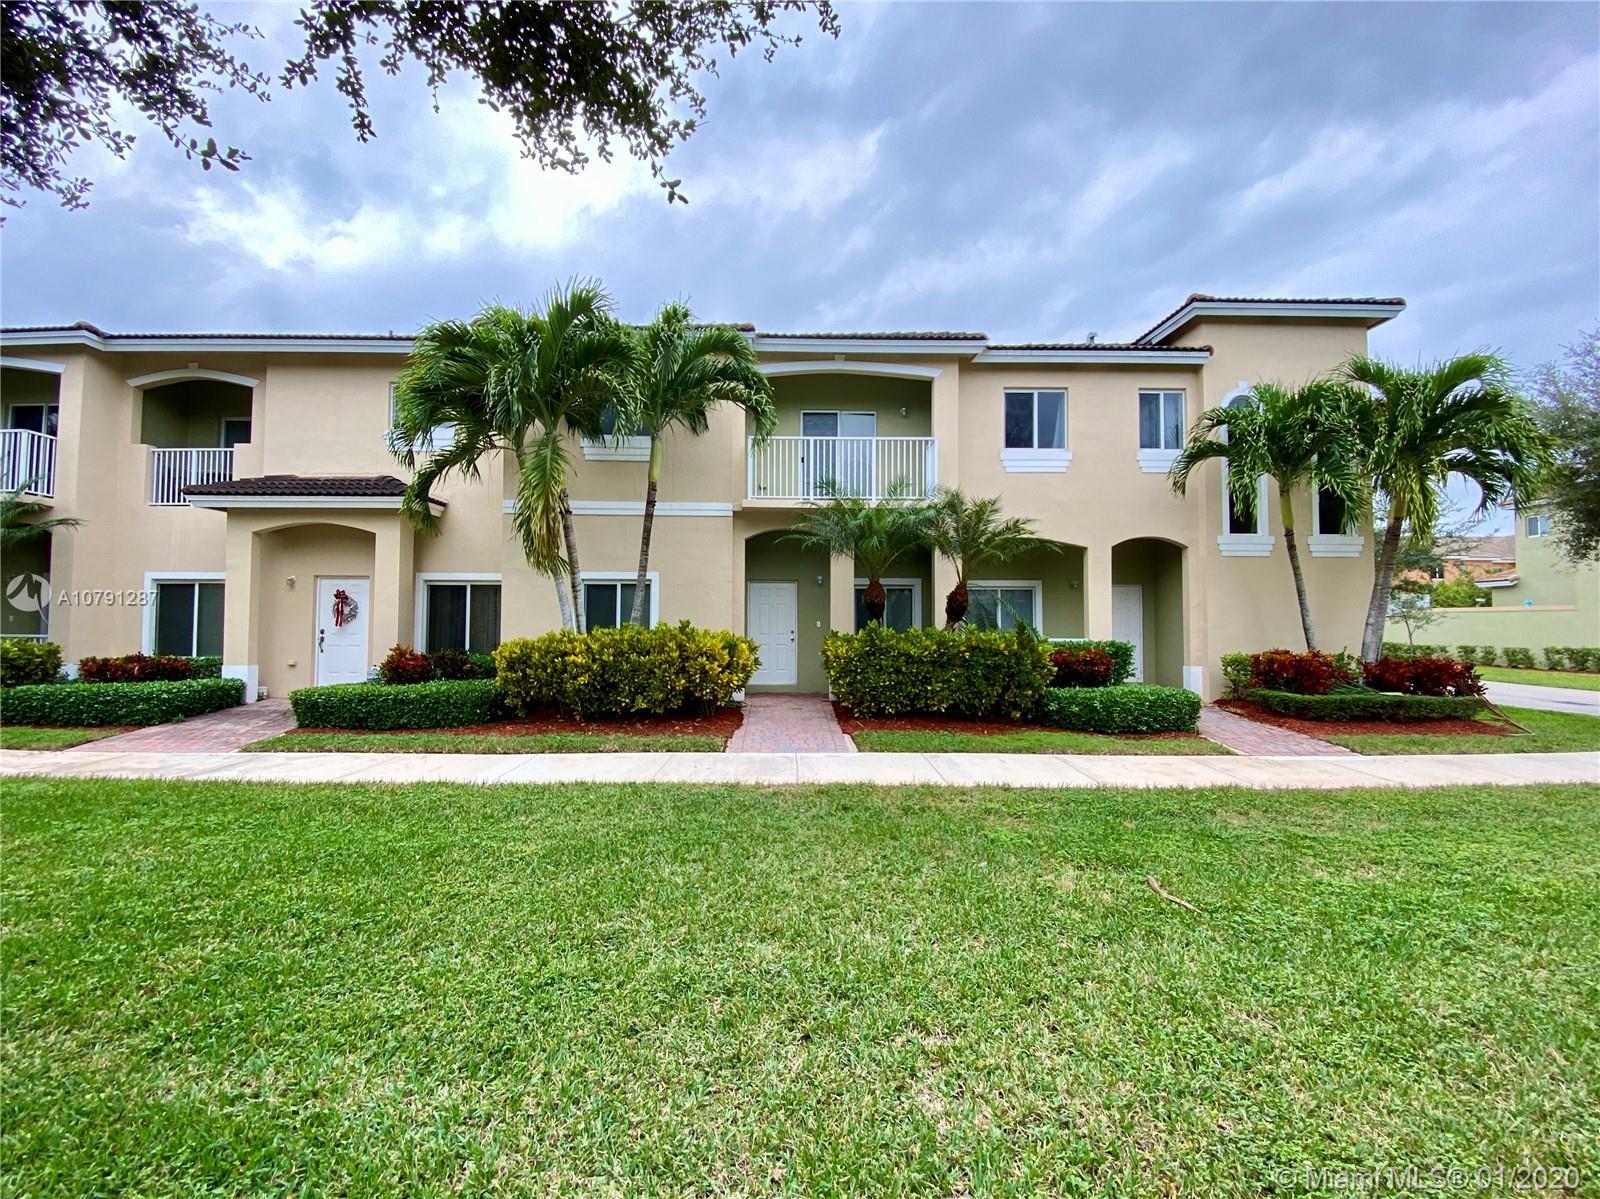 2359 SE 16th Pl, Homestead, FL 33035 - Homestead, FL real estate listing